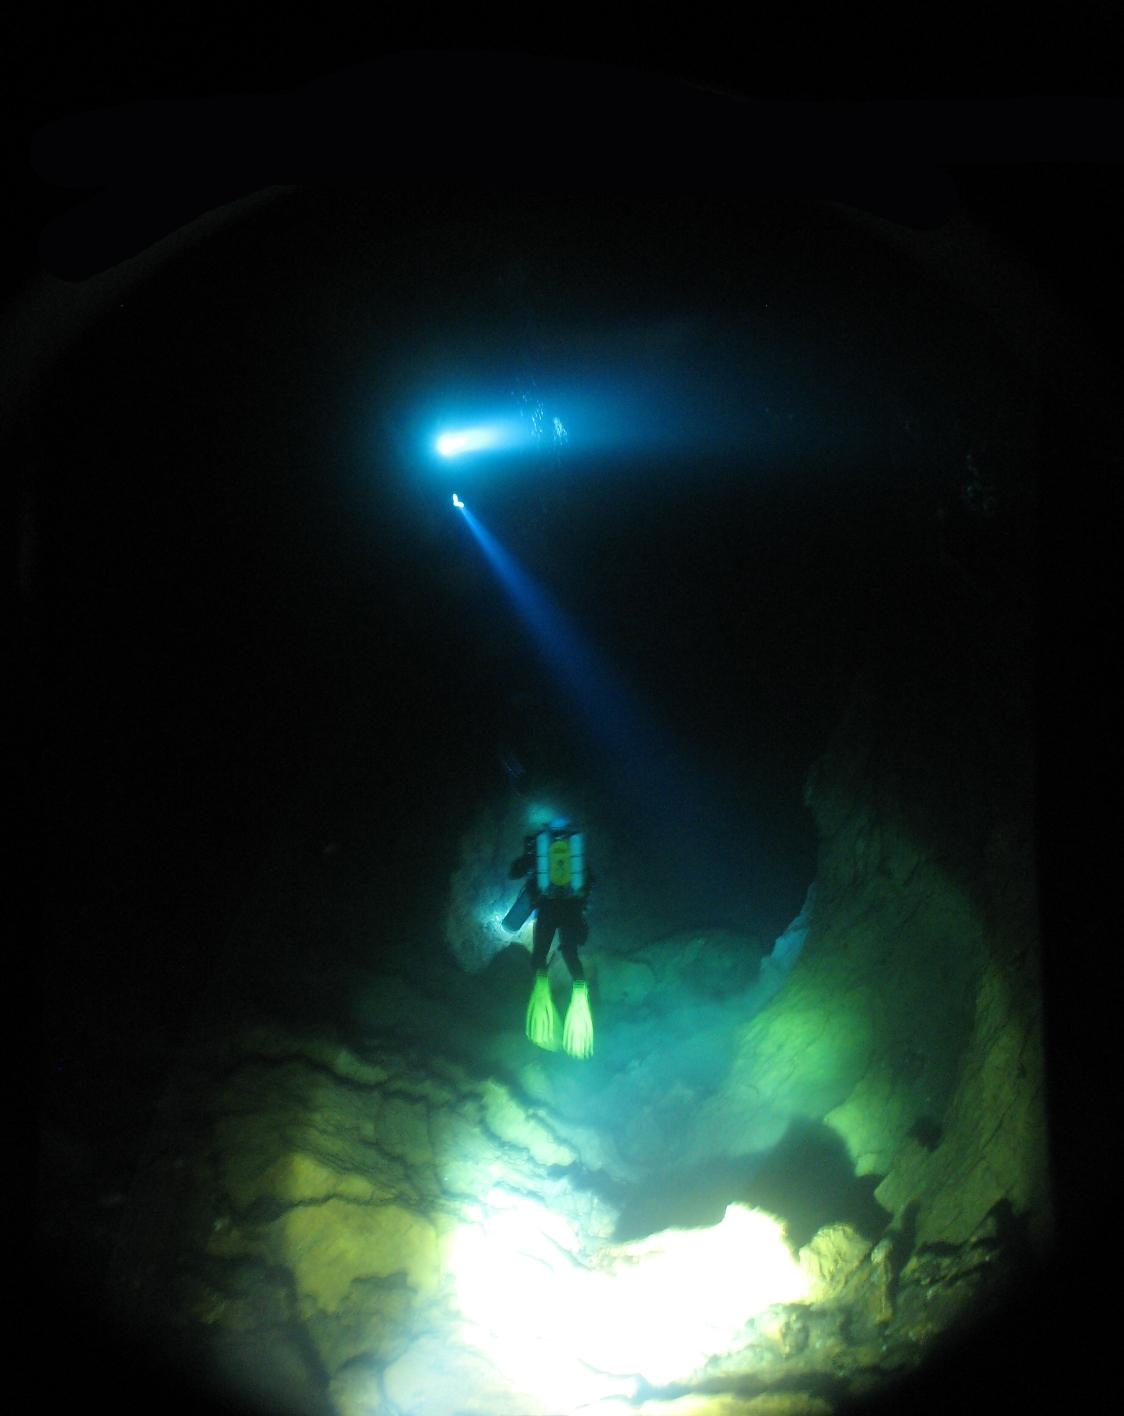 MARINE - Débuter en photo sous-marine : vos conseils IMG_4492web_4mgh71vl